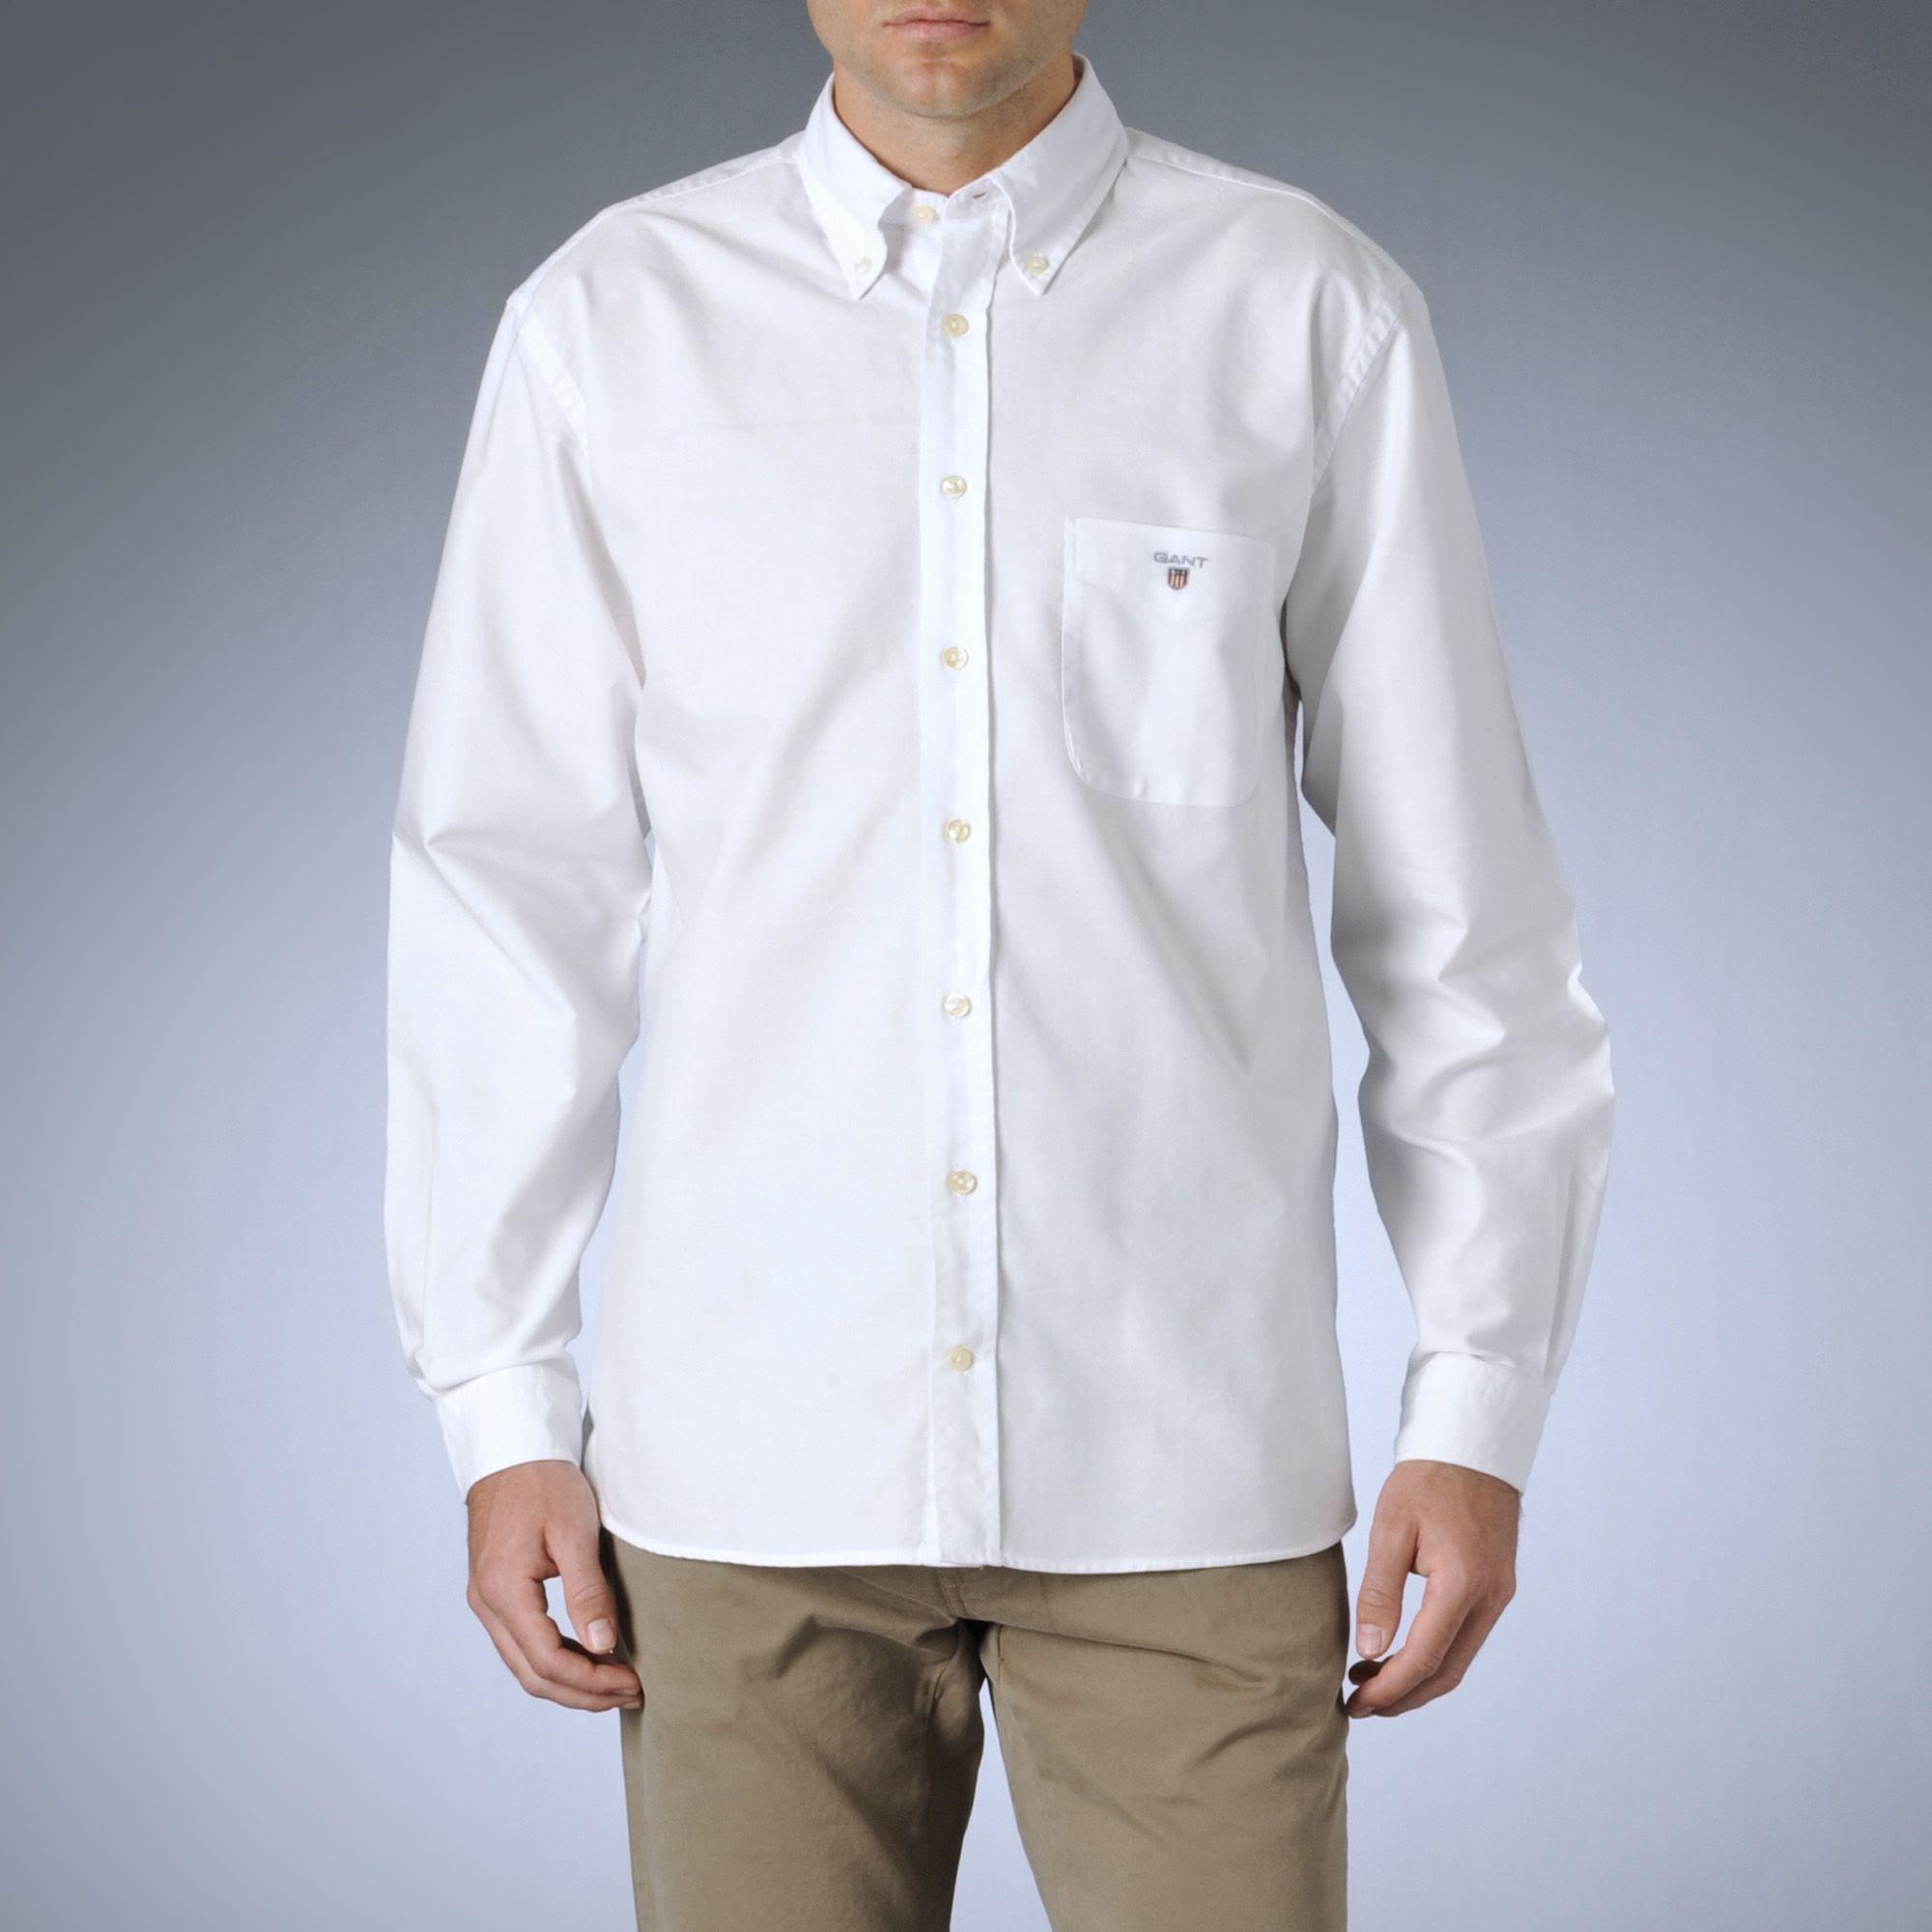 0e683faf2 GANT White Oxford Shirt for men